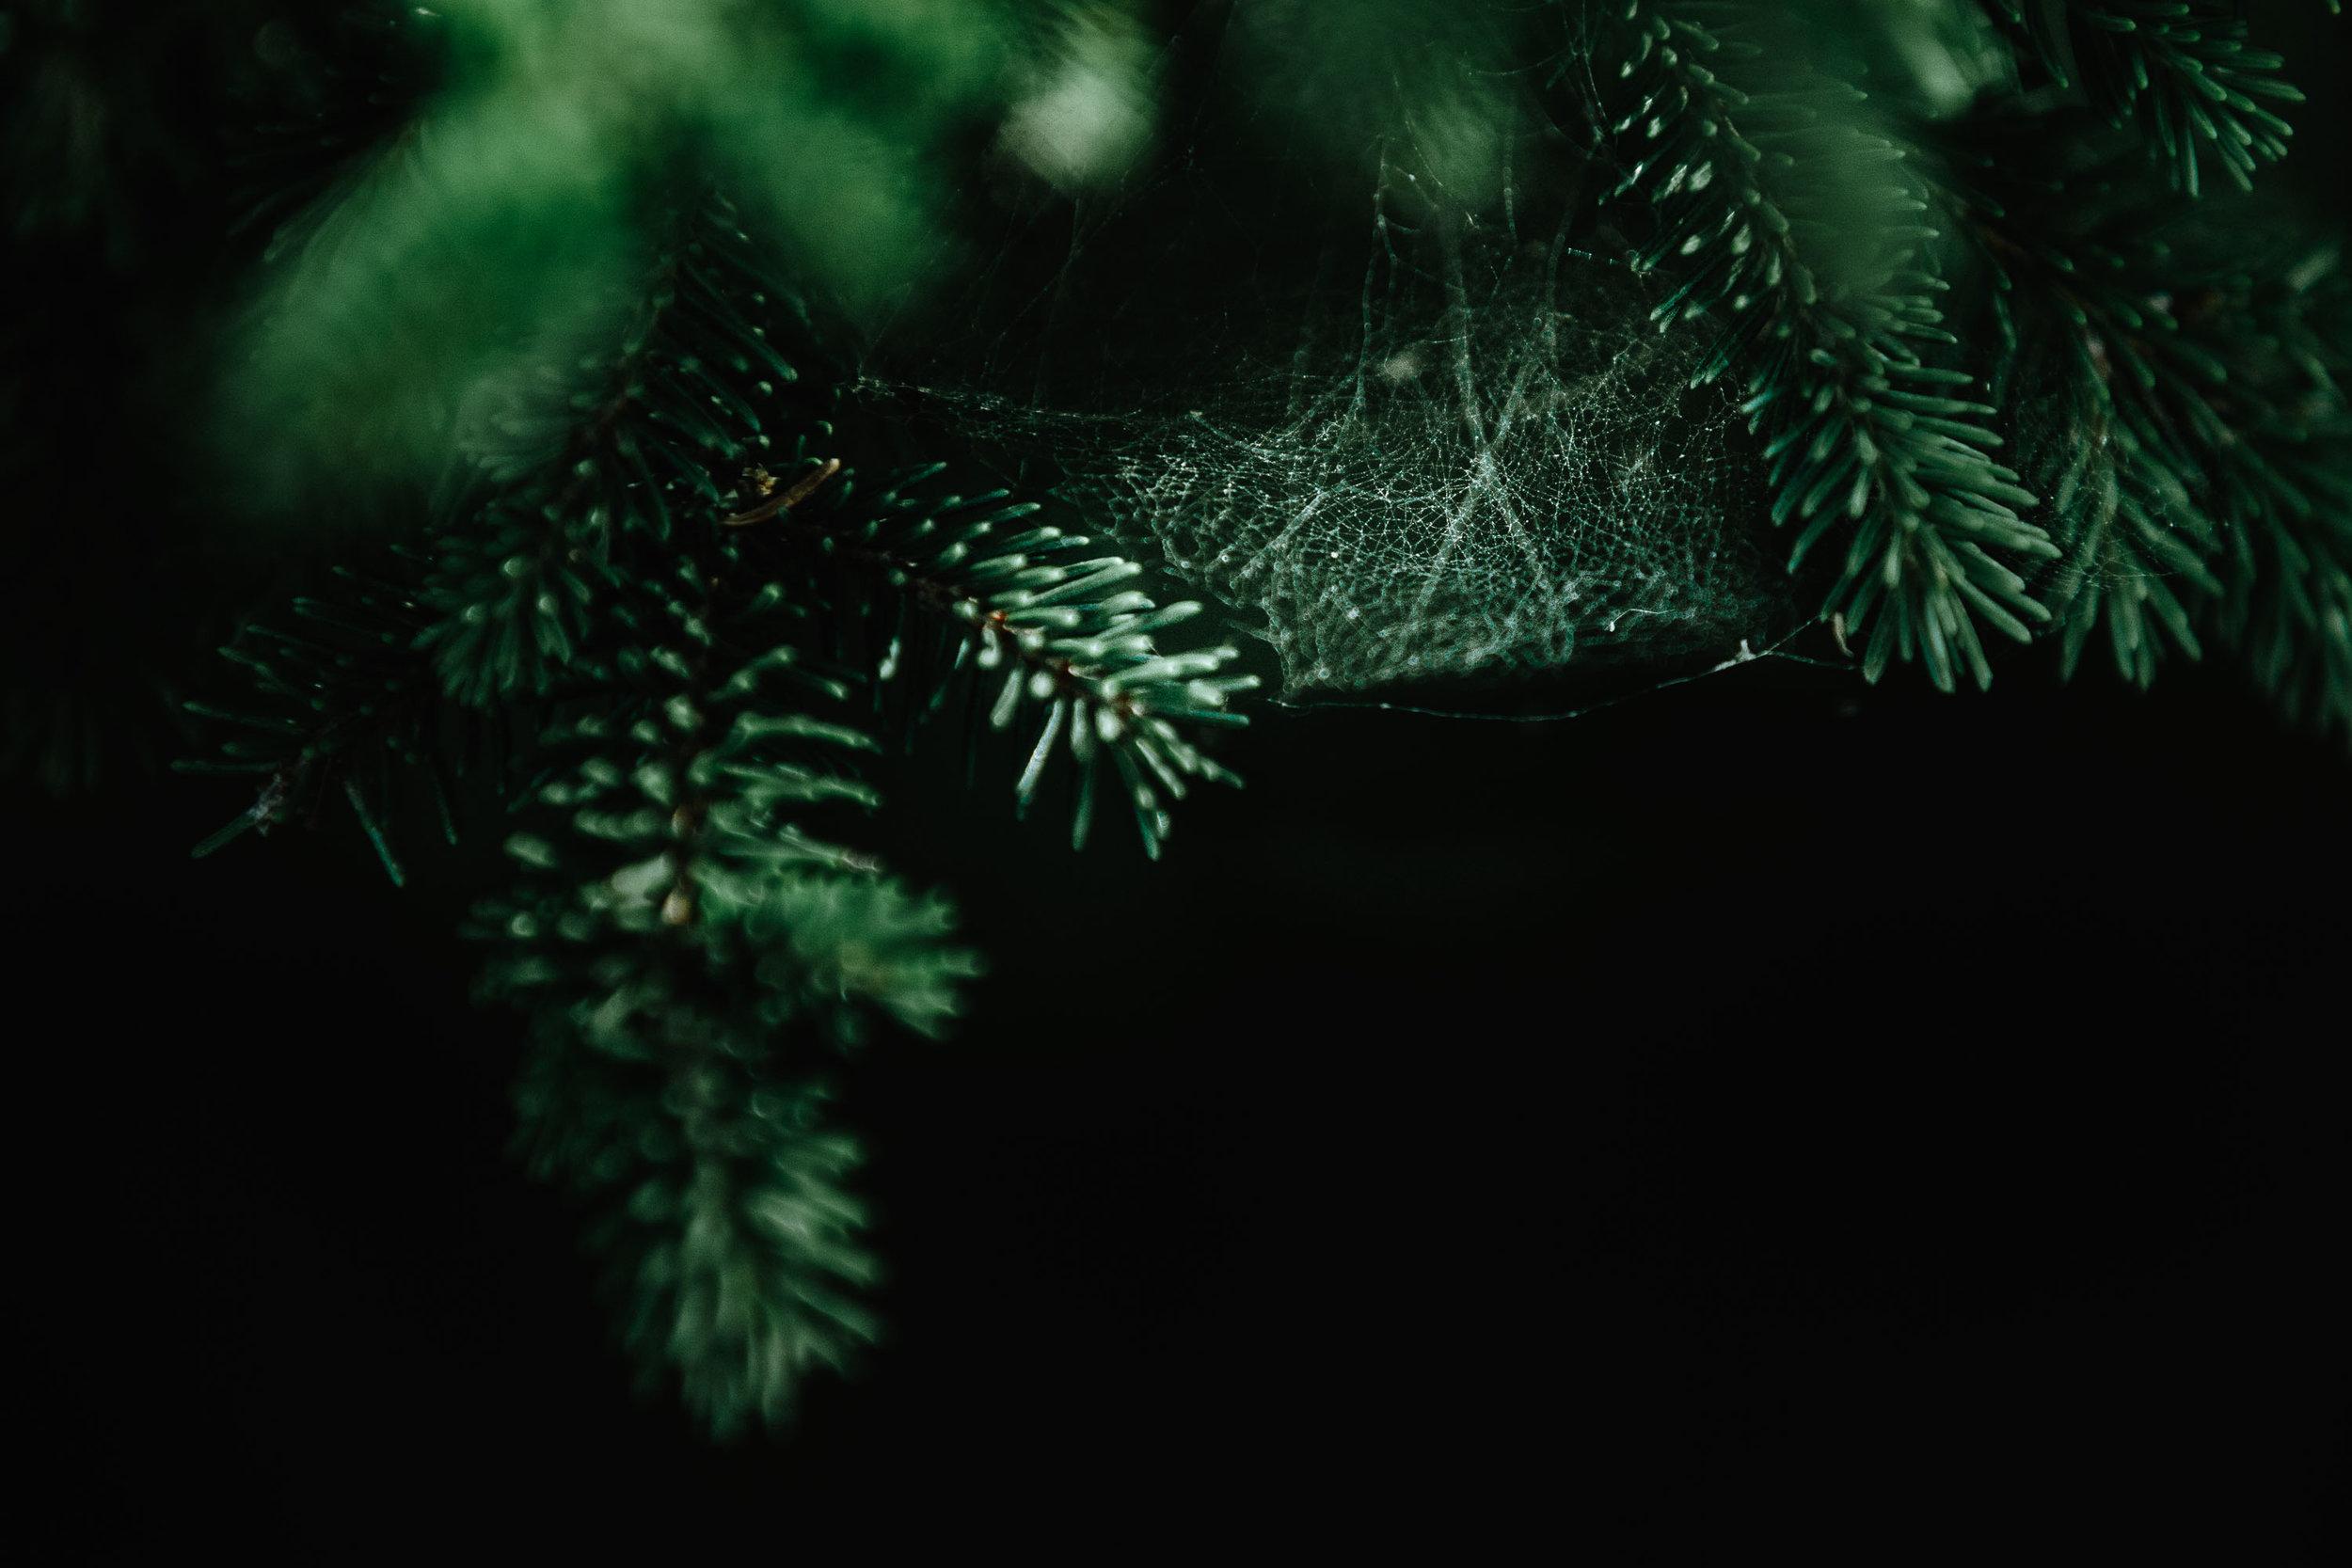 2017-10-09-@jmvotography-julian-mittelstaedt-fotograf-muenchen-foto-photo-9V2B6797.jpg